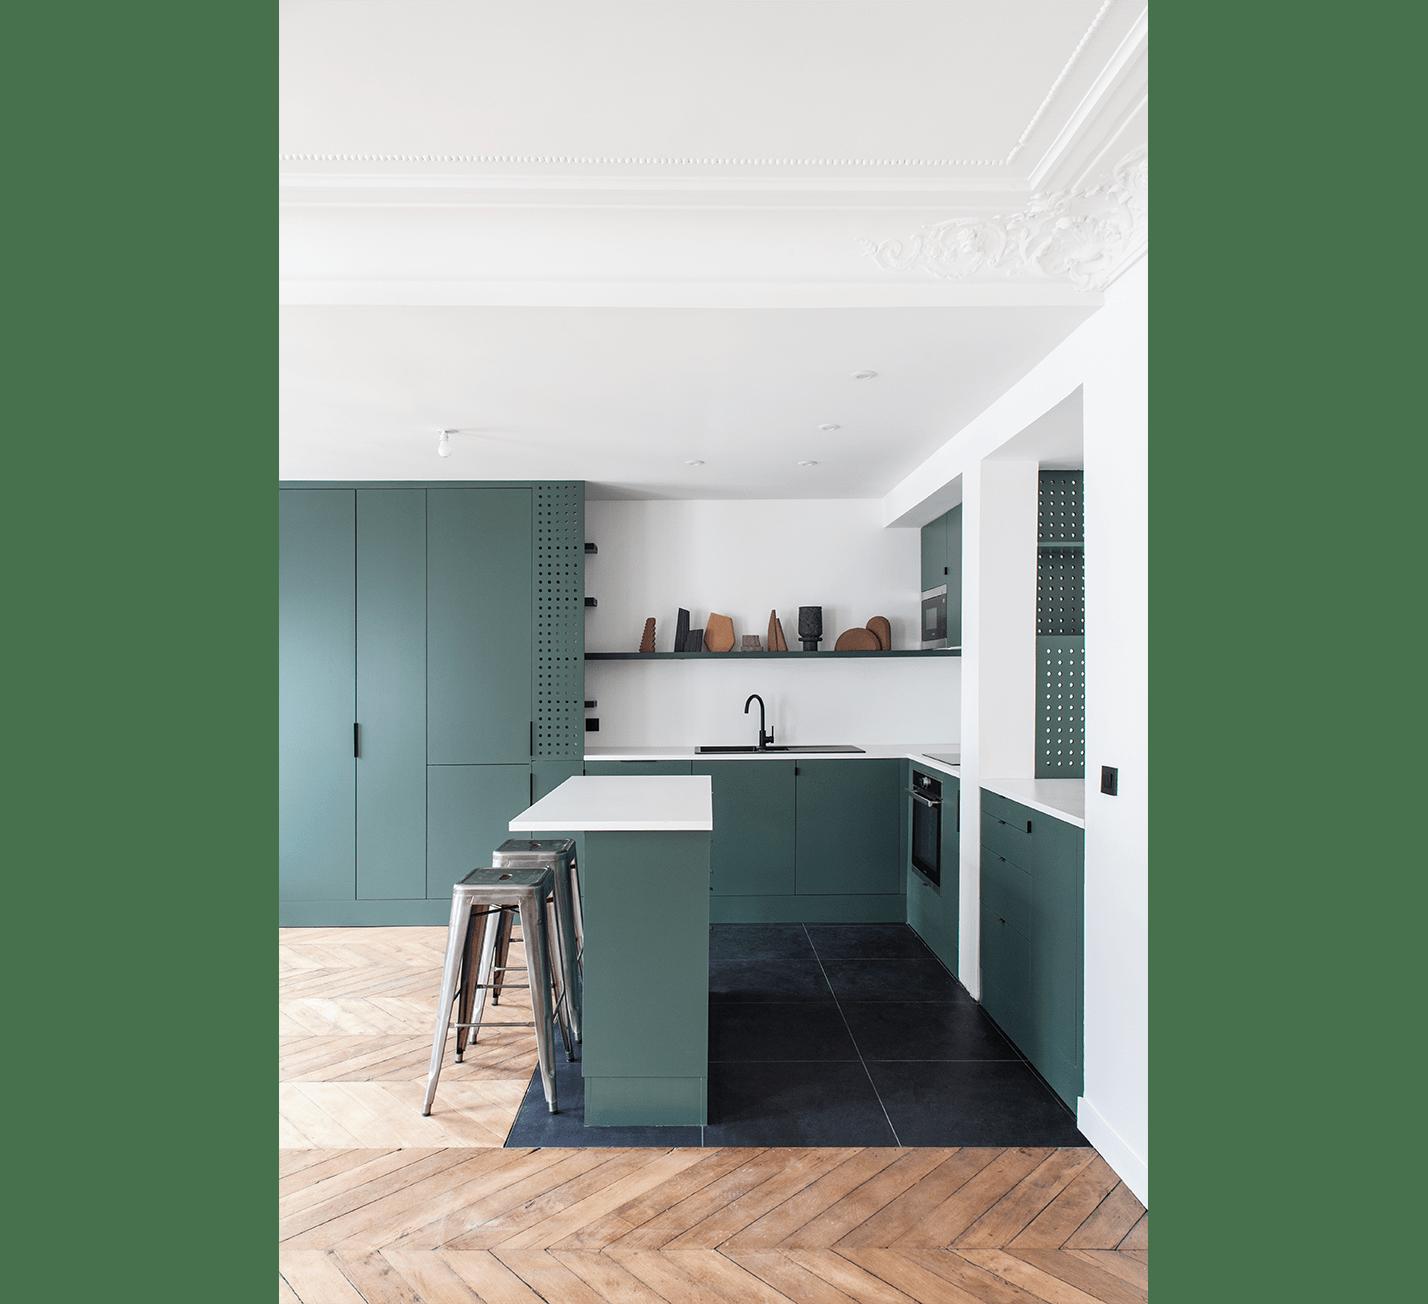 Projet-Jules-Cesar-Atelier-Steve-Pauline-Borgia-Architecte-interieur-01-min